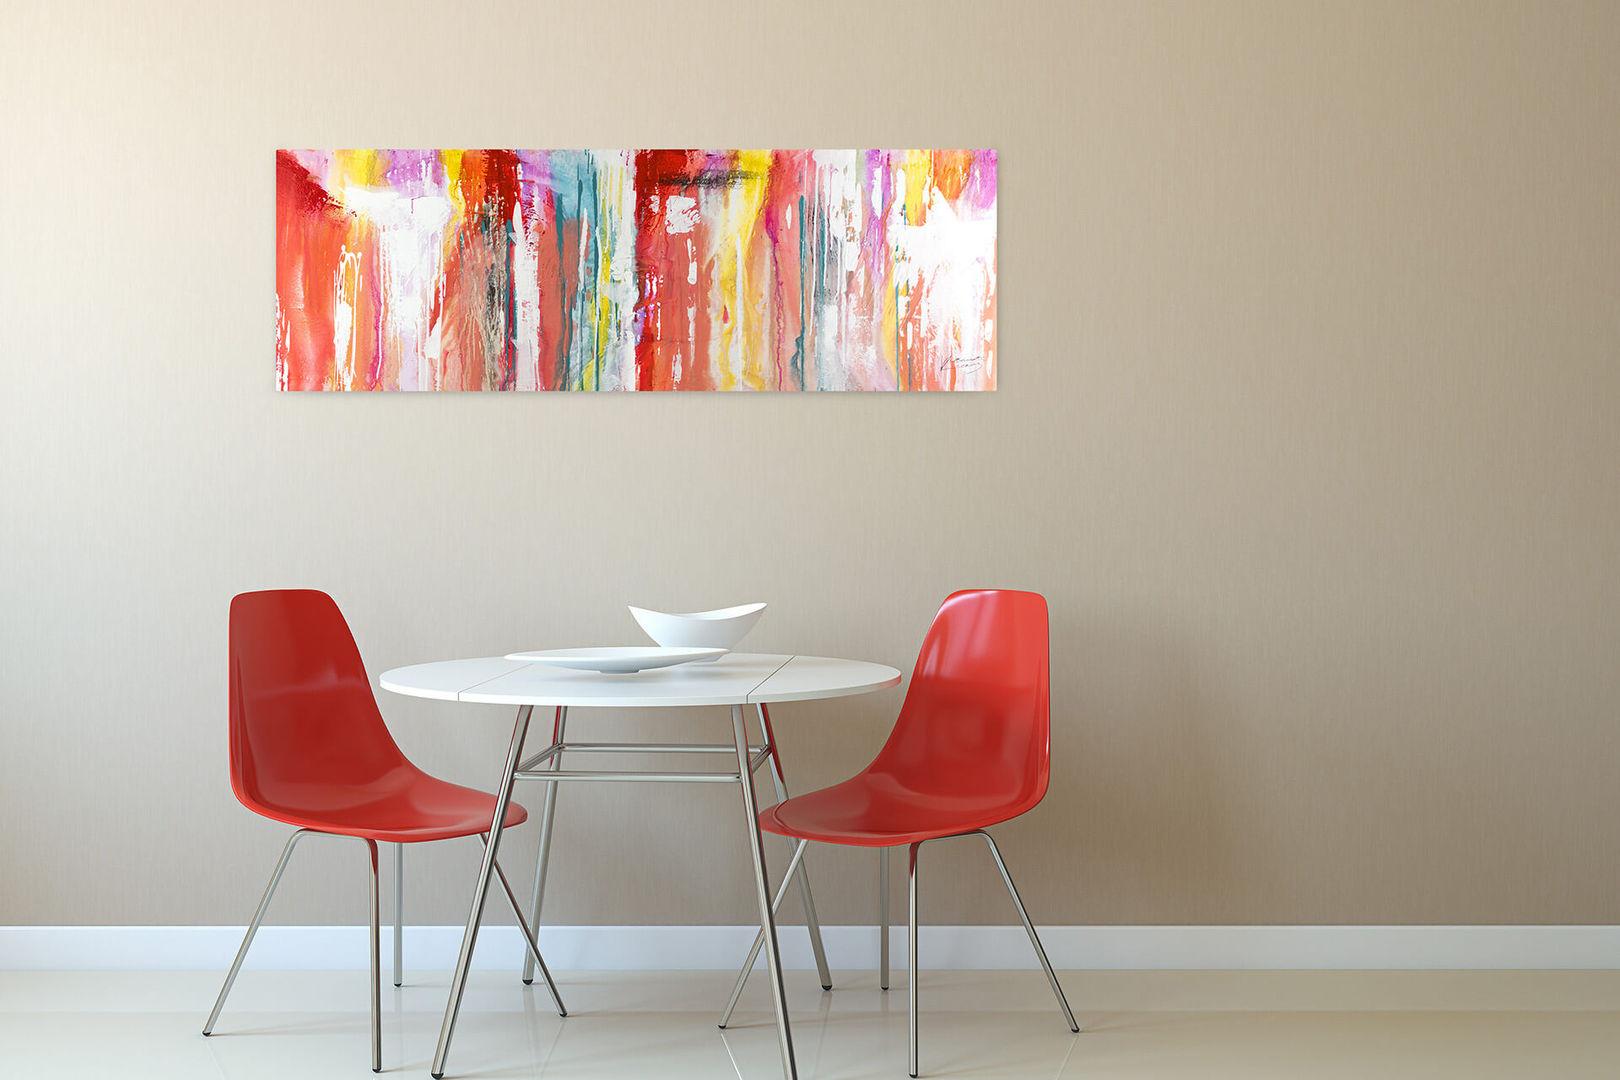 Kl00067 vertikal laufende bunte farbverlaeufe modern acryl gemaelde 08